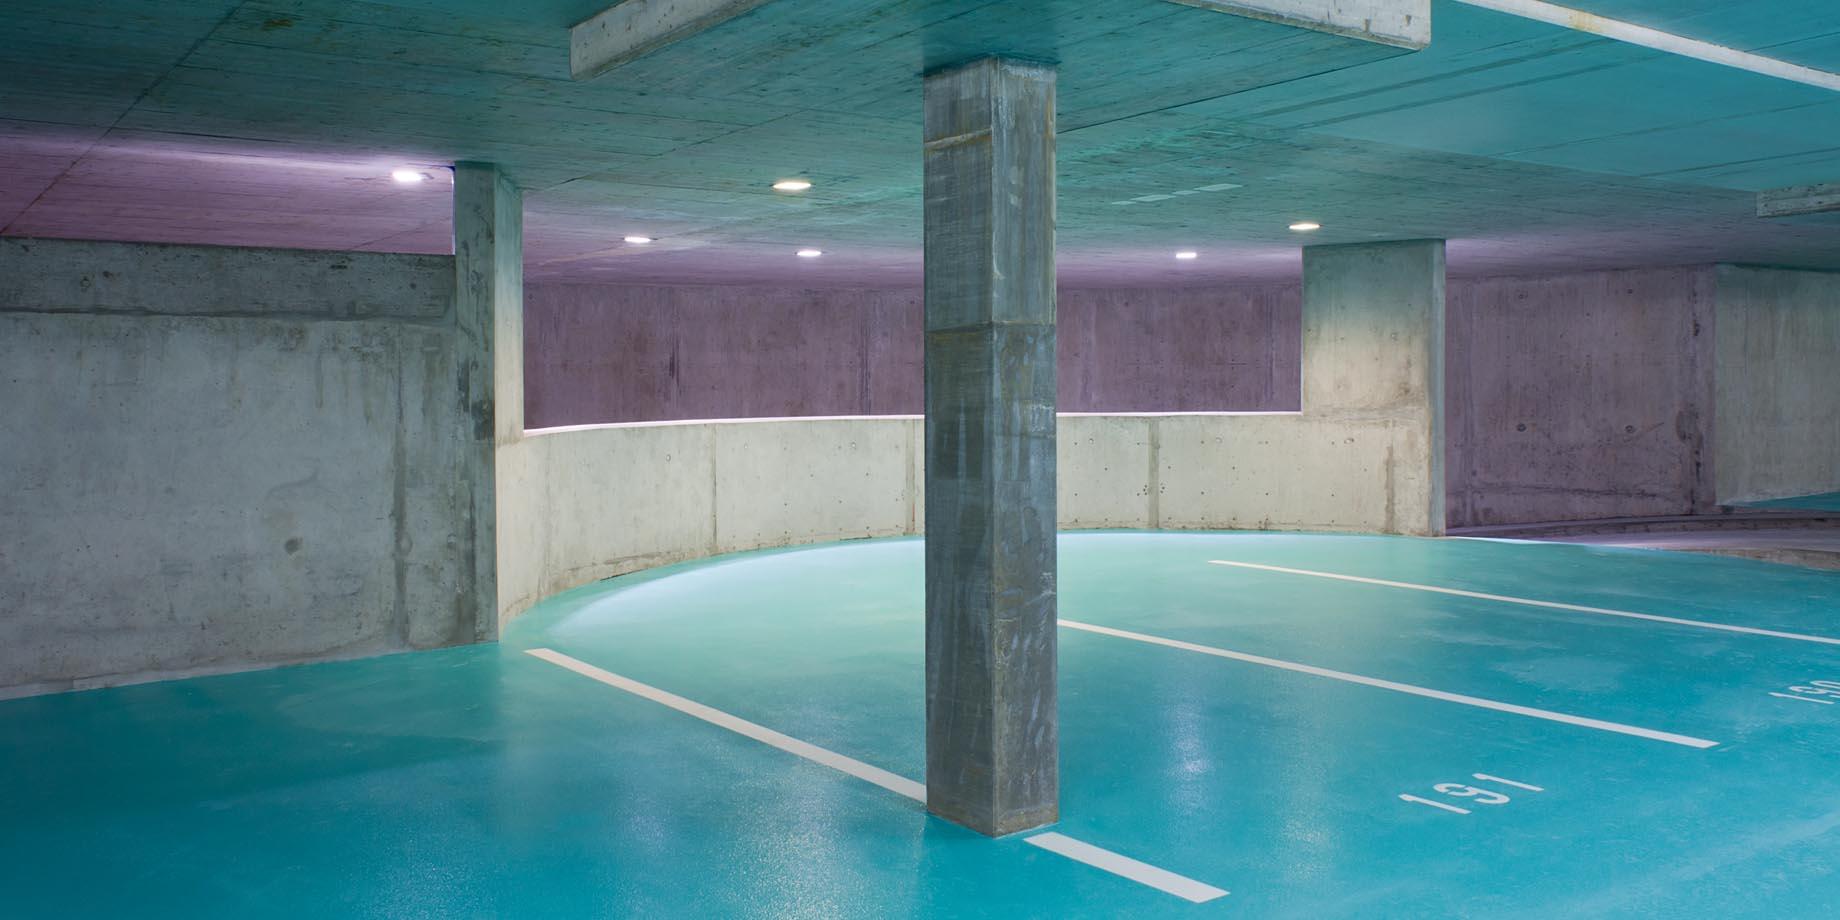 maskarade-architecture-arosa-parkgarage-innerarosa-2011-touristique-parking-stationnement-beton-1840